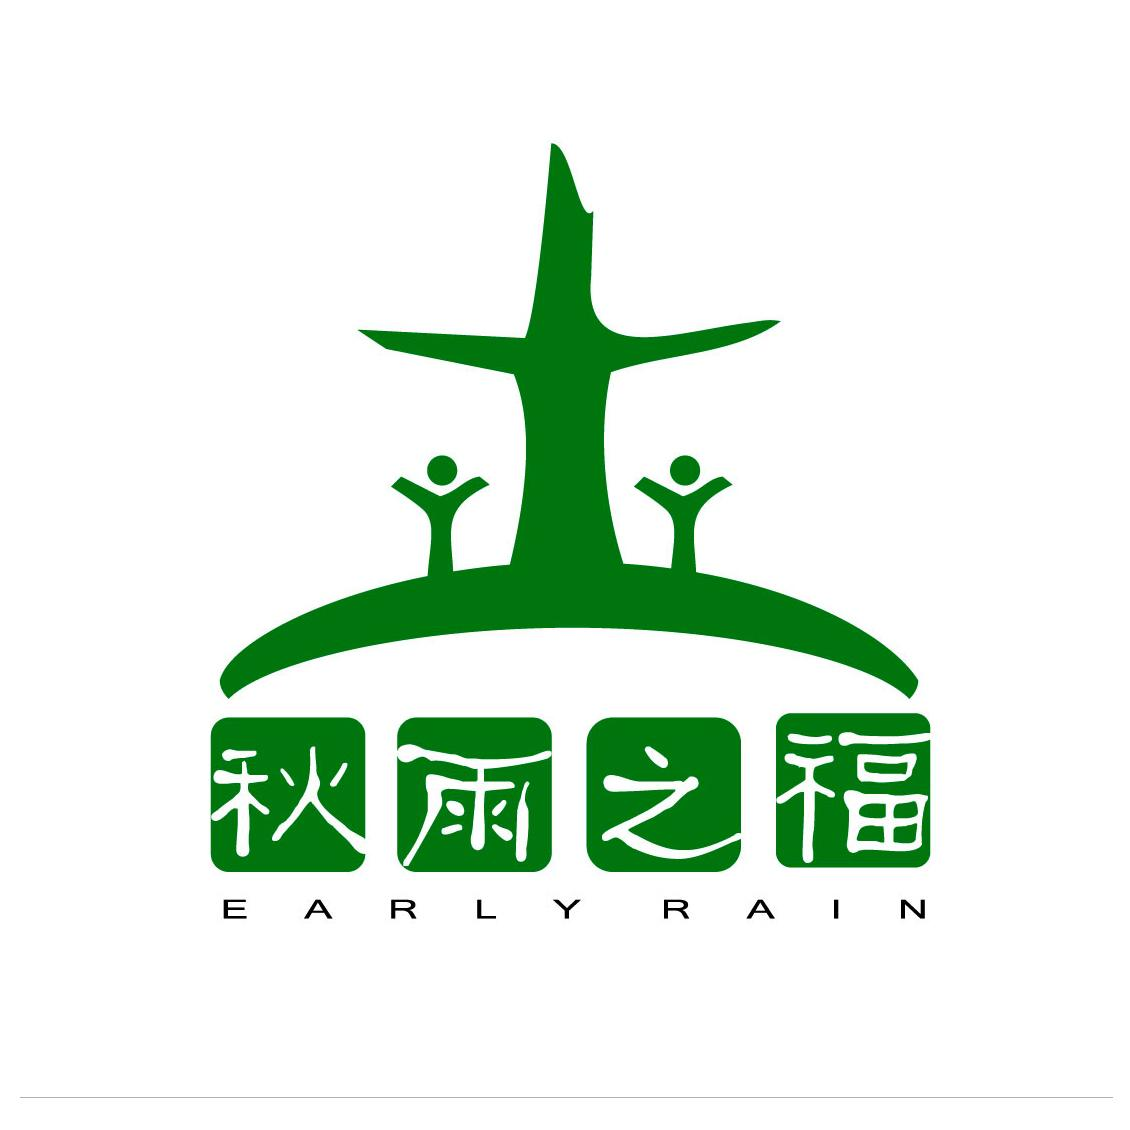 环保天蓝banner素材